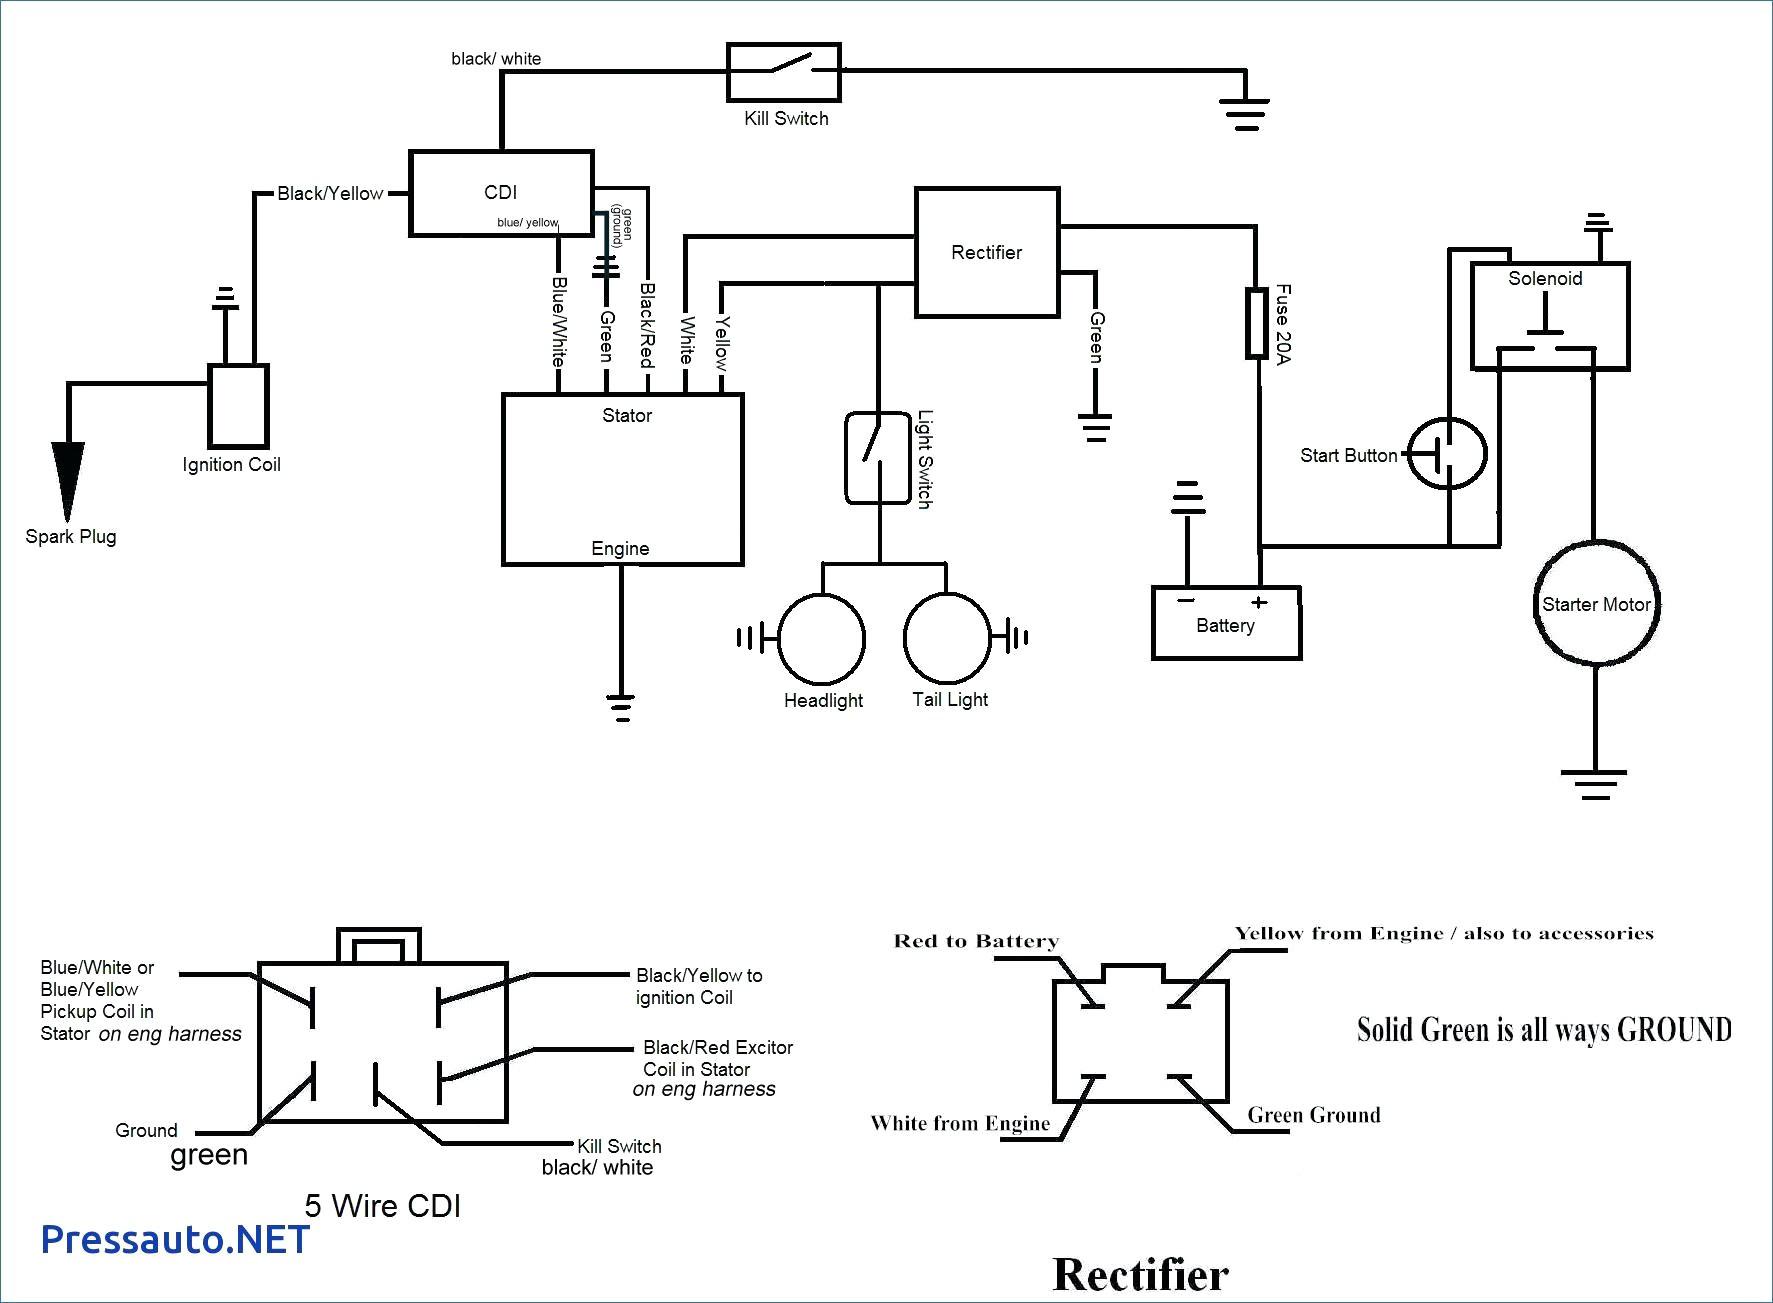 Chinese Gy6 Wiring Diagram - Schema Wiring Diagram - Gy6 Cdi Wiring Diagram